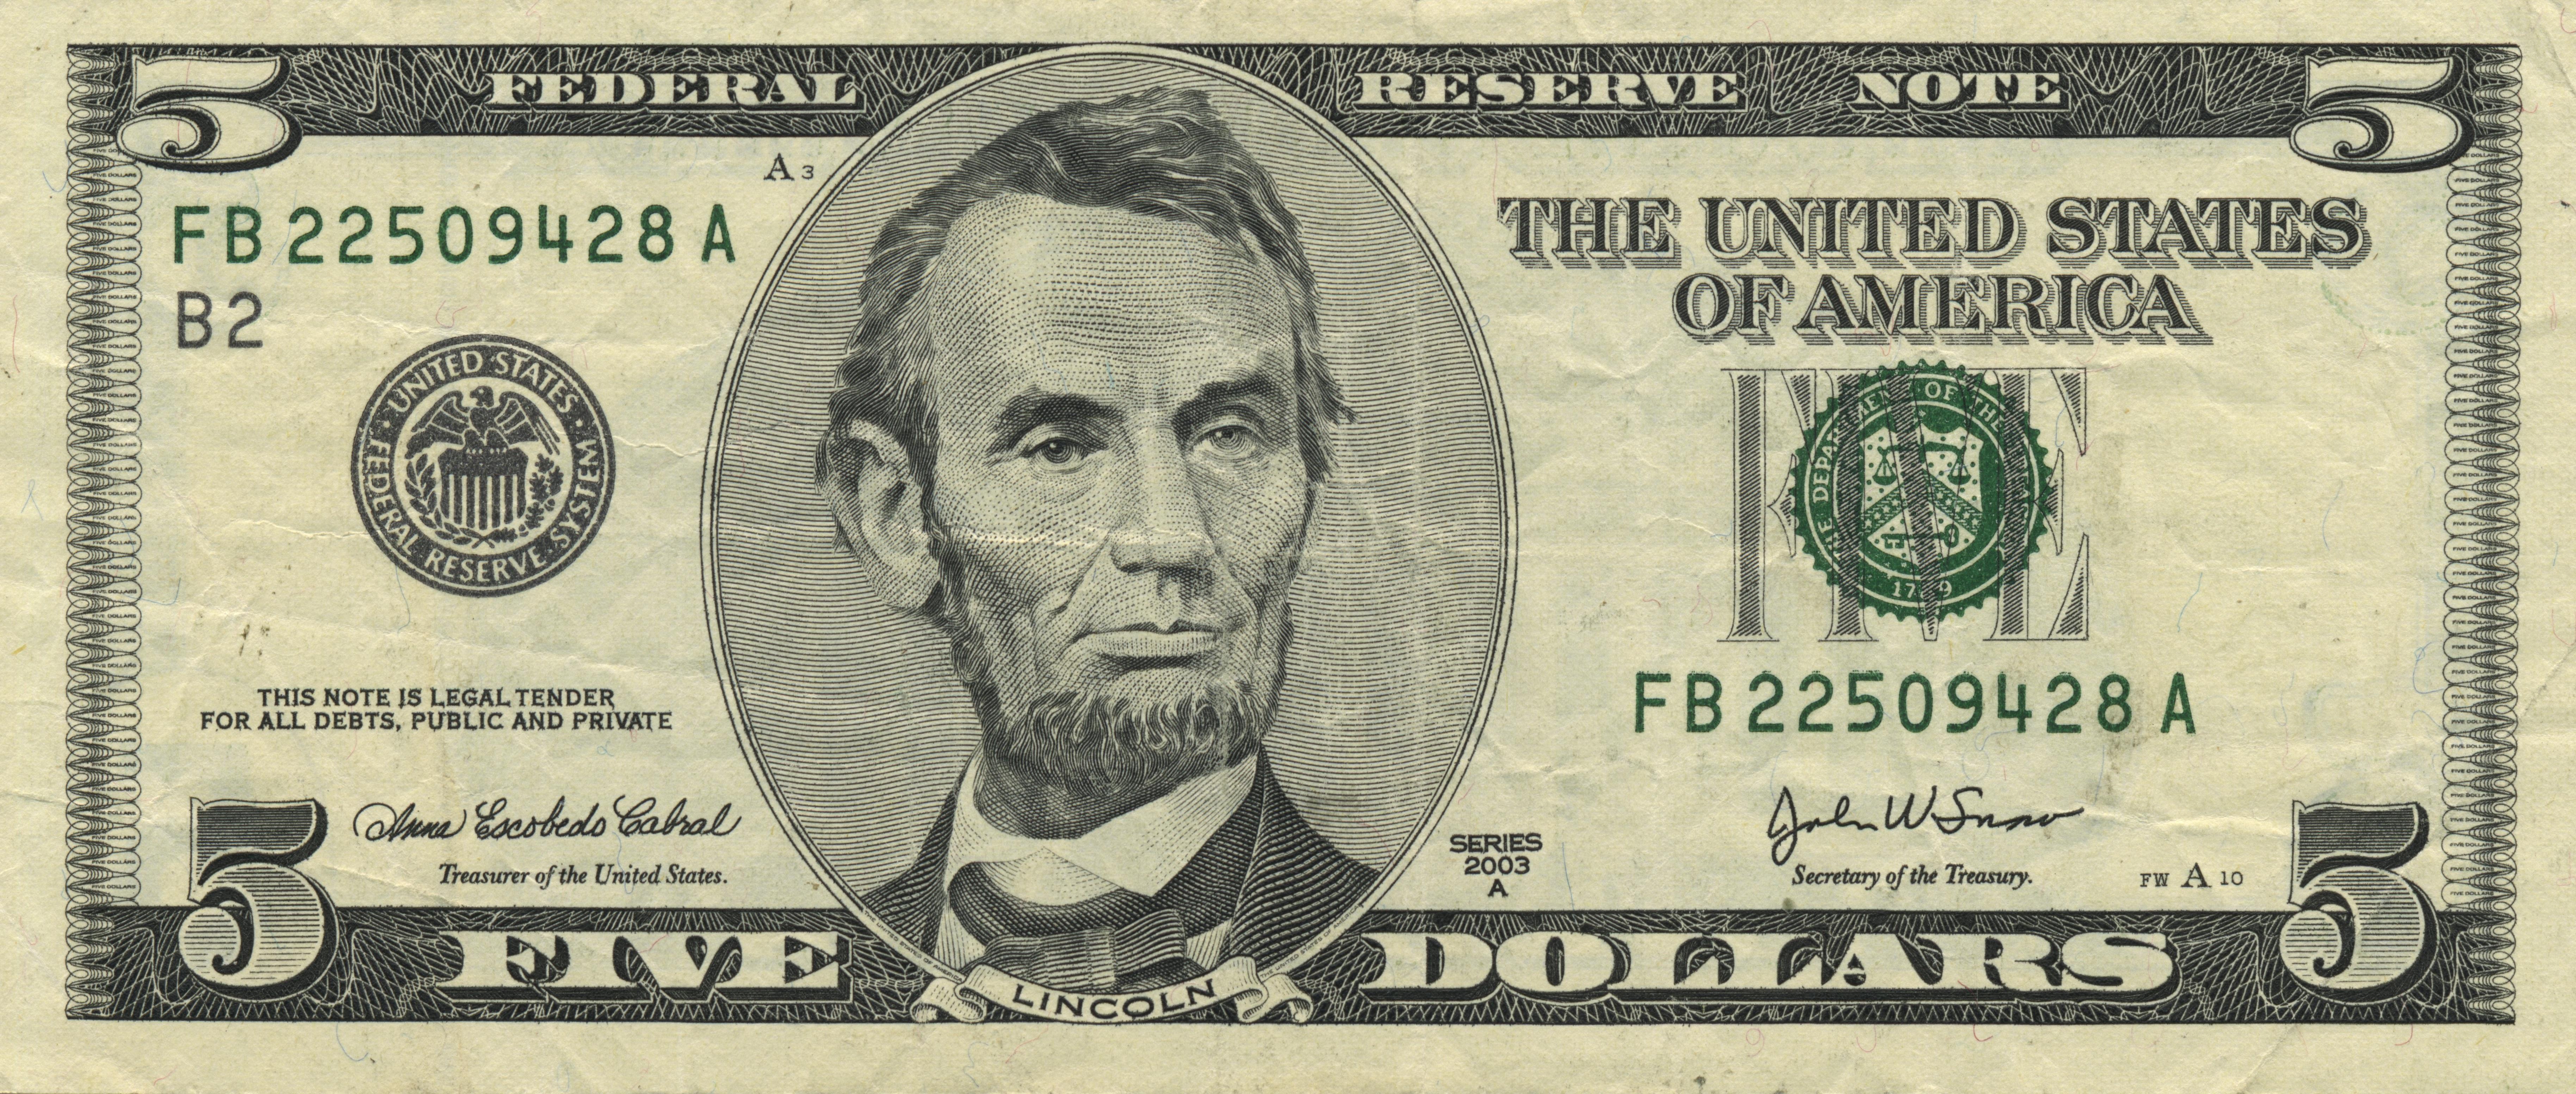 Dollar 5k Retina Ultra Hd Wallpaper And Background Image